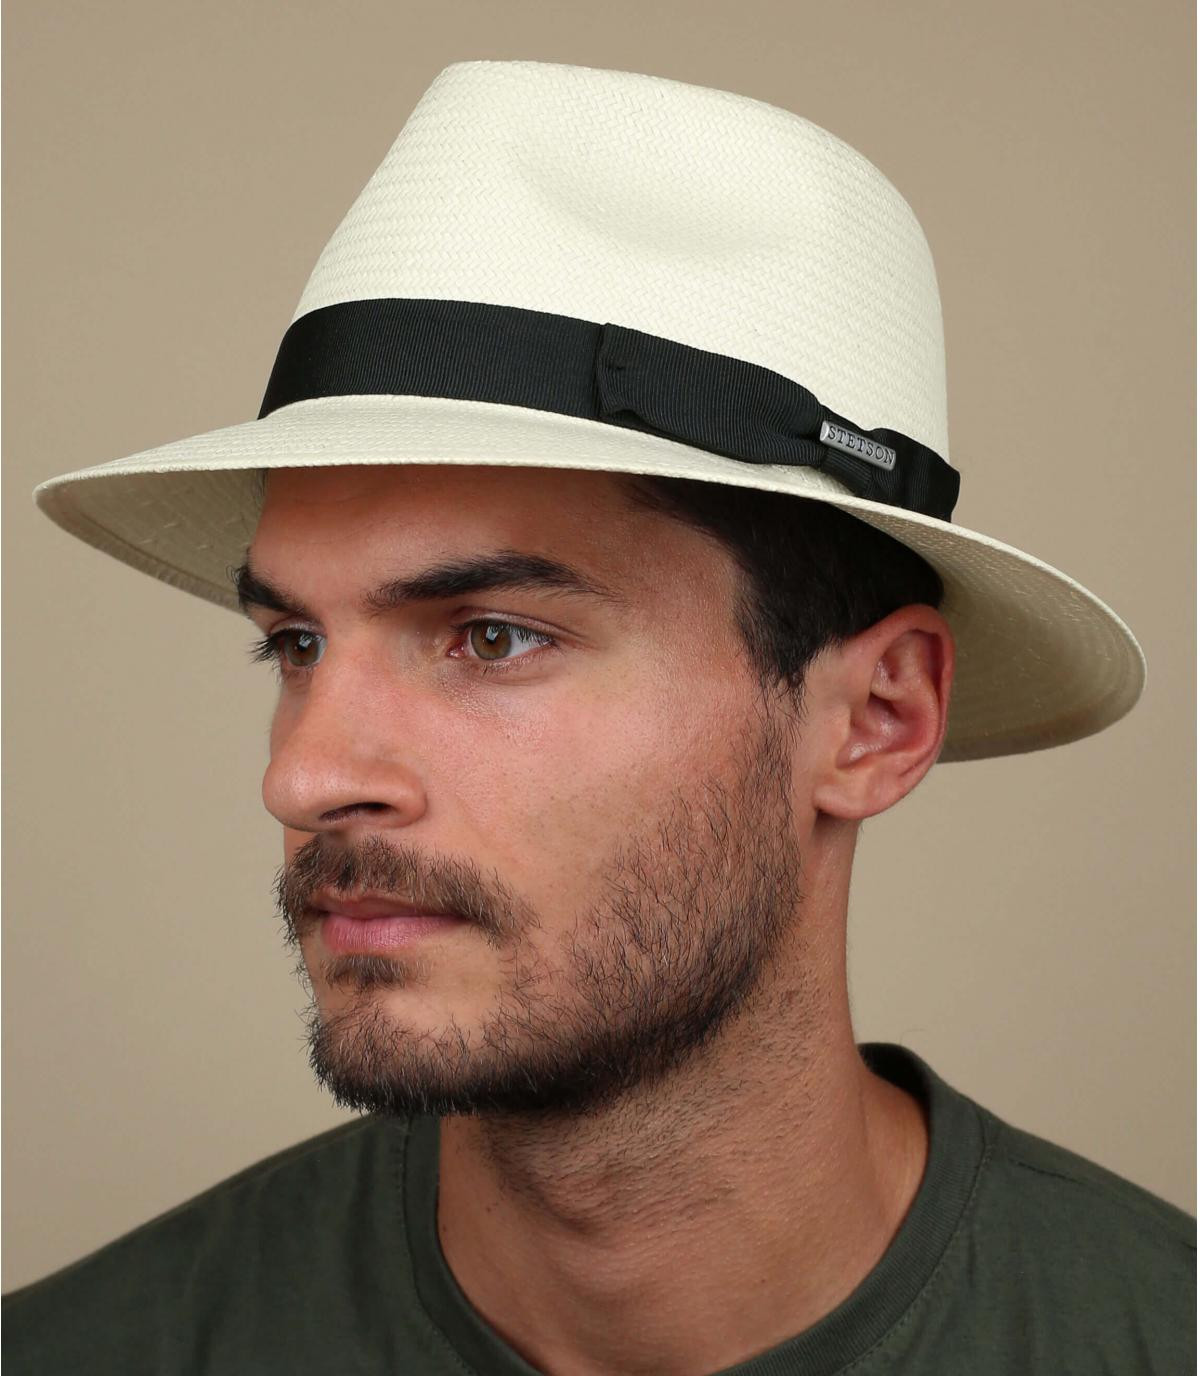 Sombrero panama Stetson